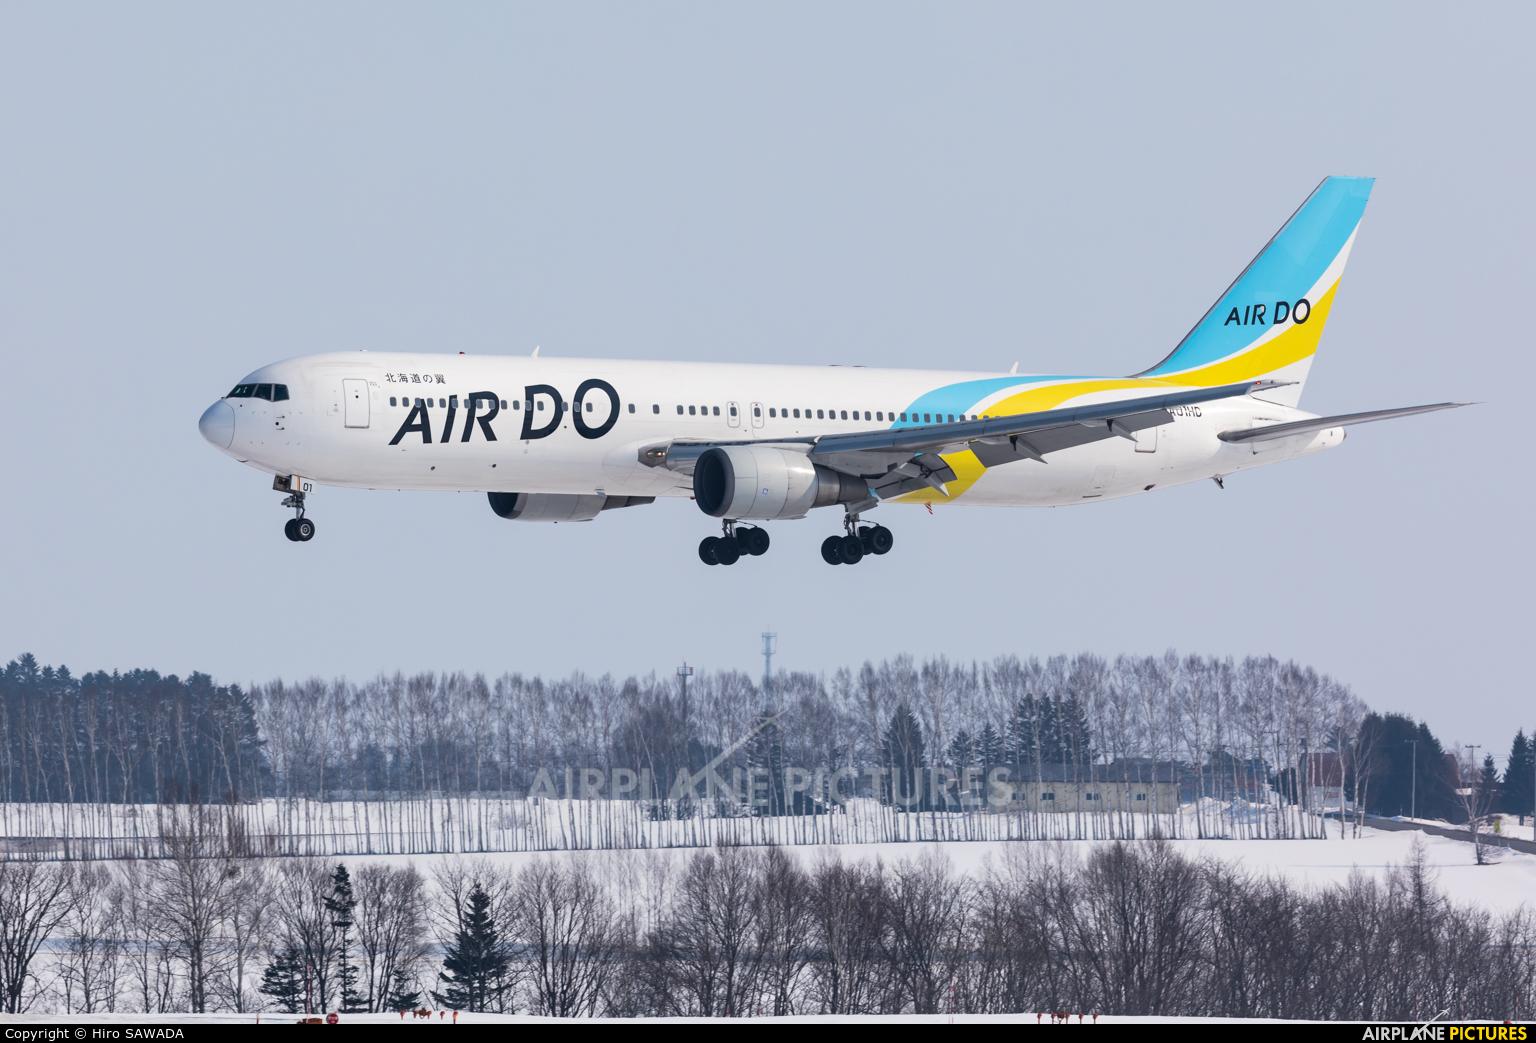 Air Do - Hokkaido International Airlines JA01HD aircraft at Memanbetsu